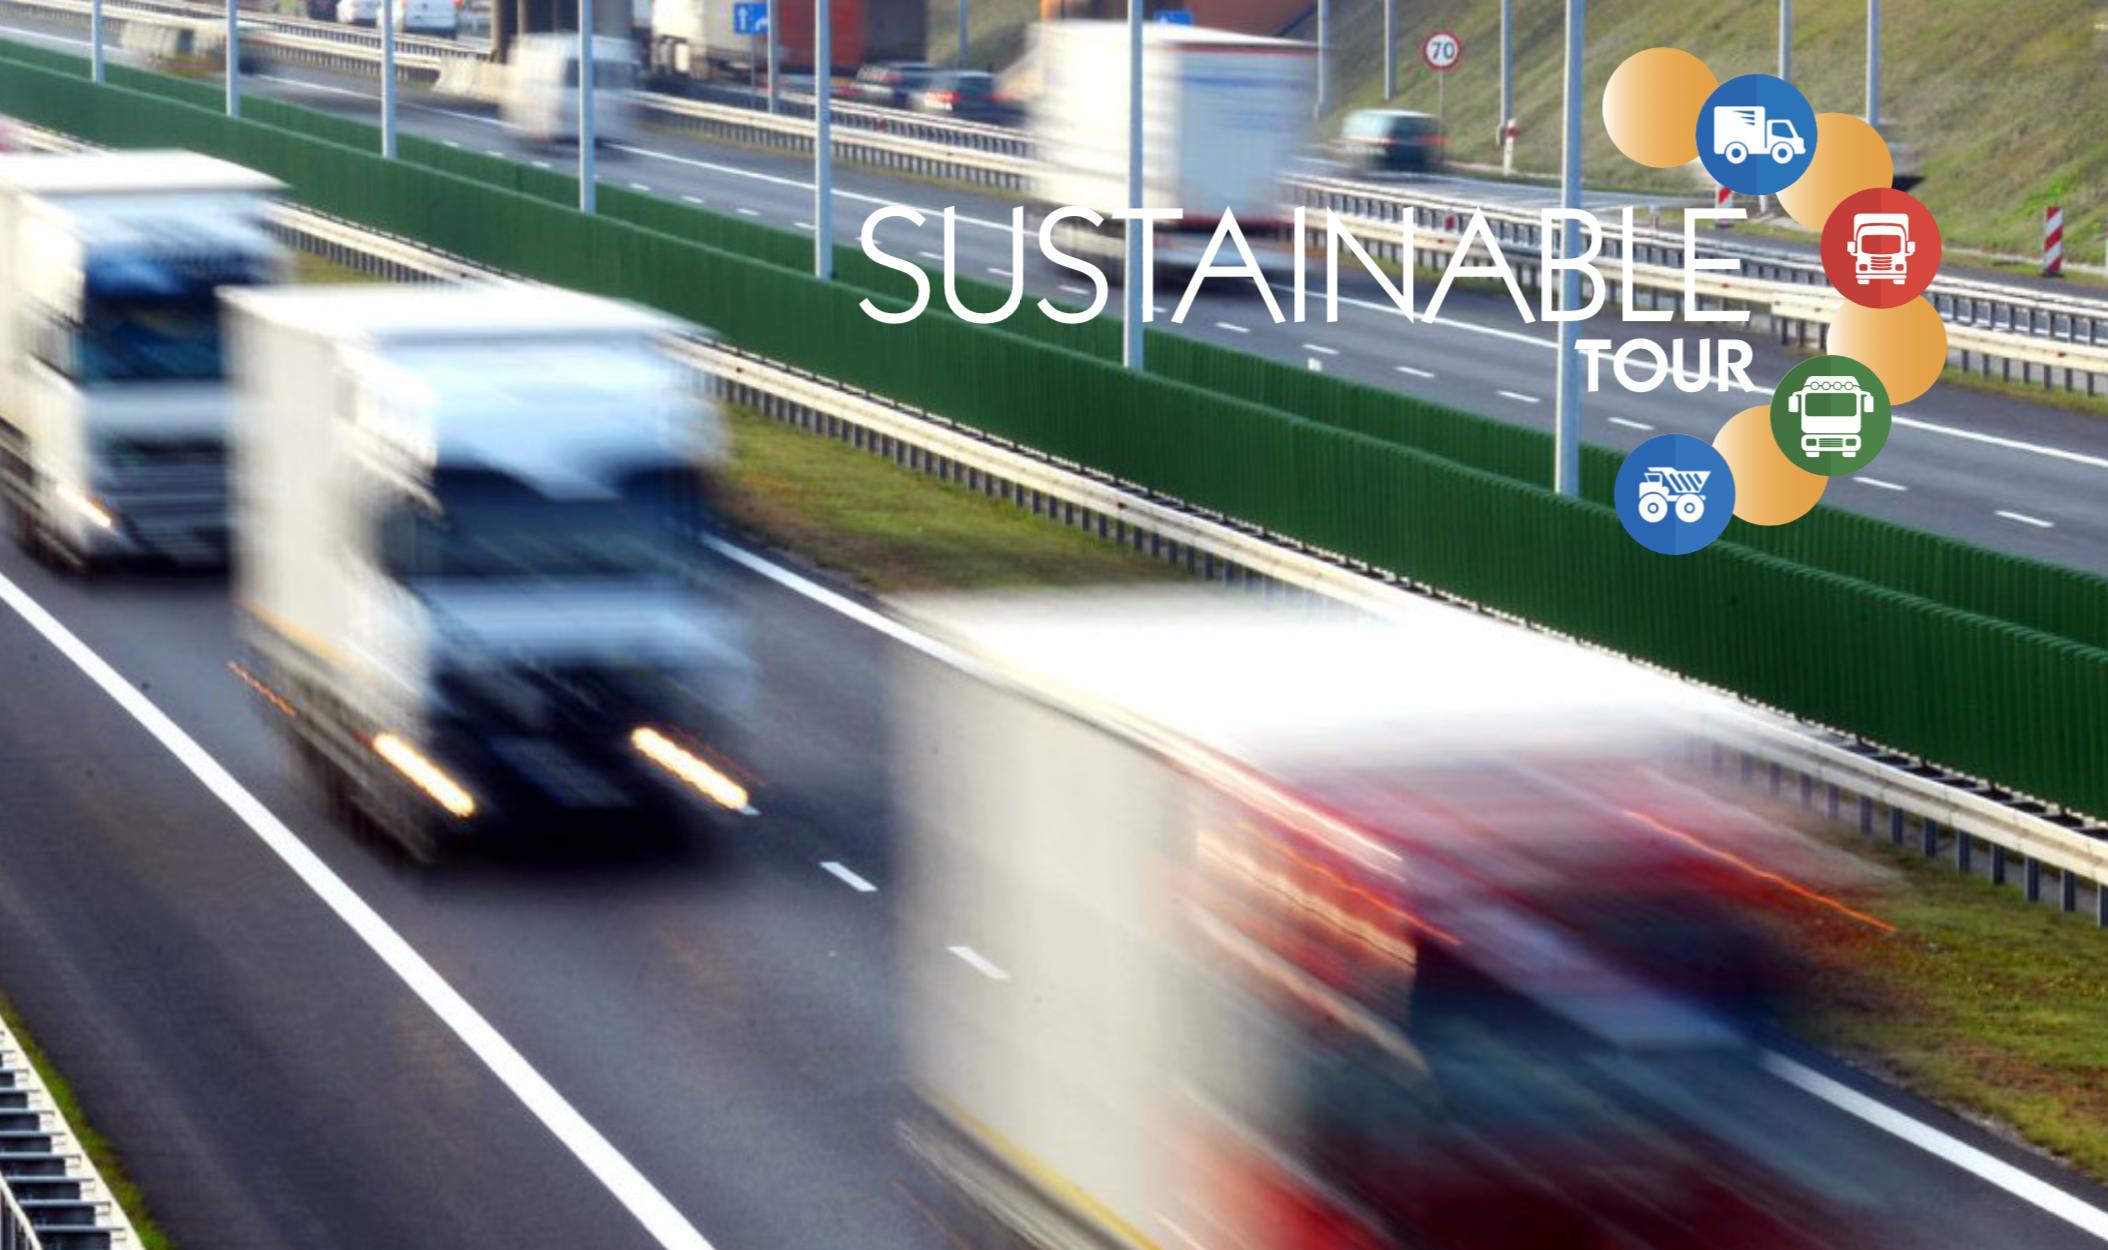 Sustainable Tour 2019